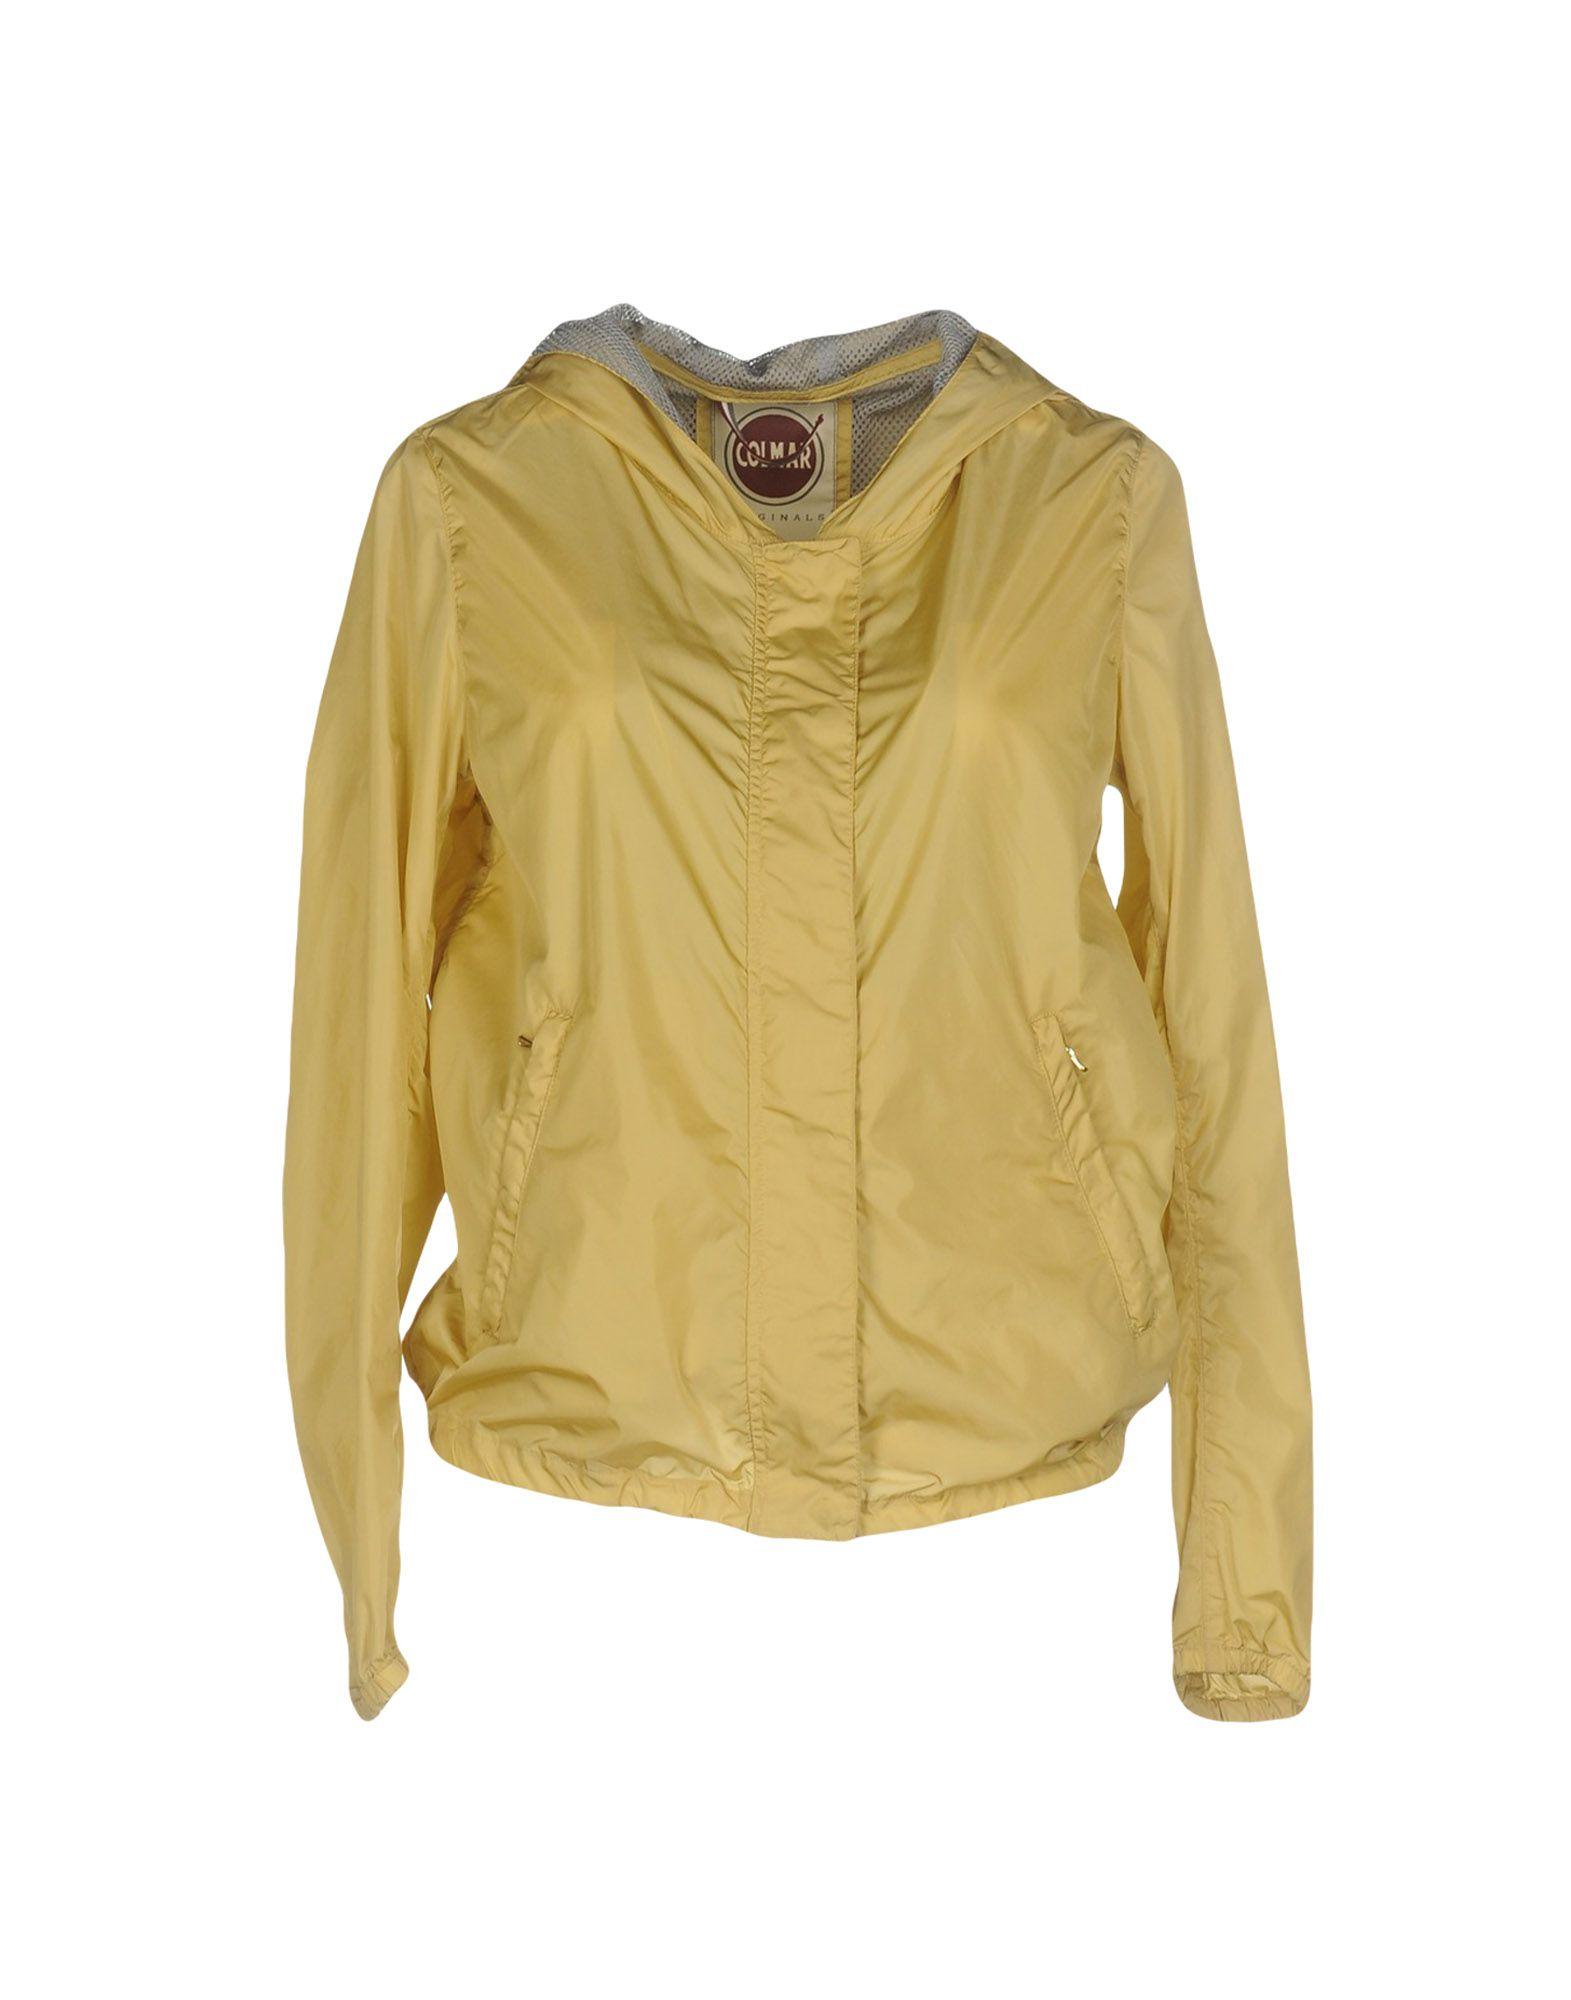 COLMAR ORIGINALS Jacket in Yellow